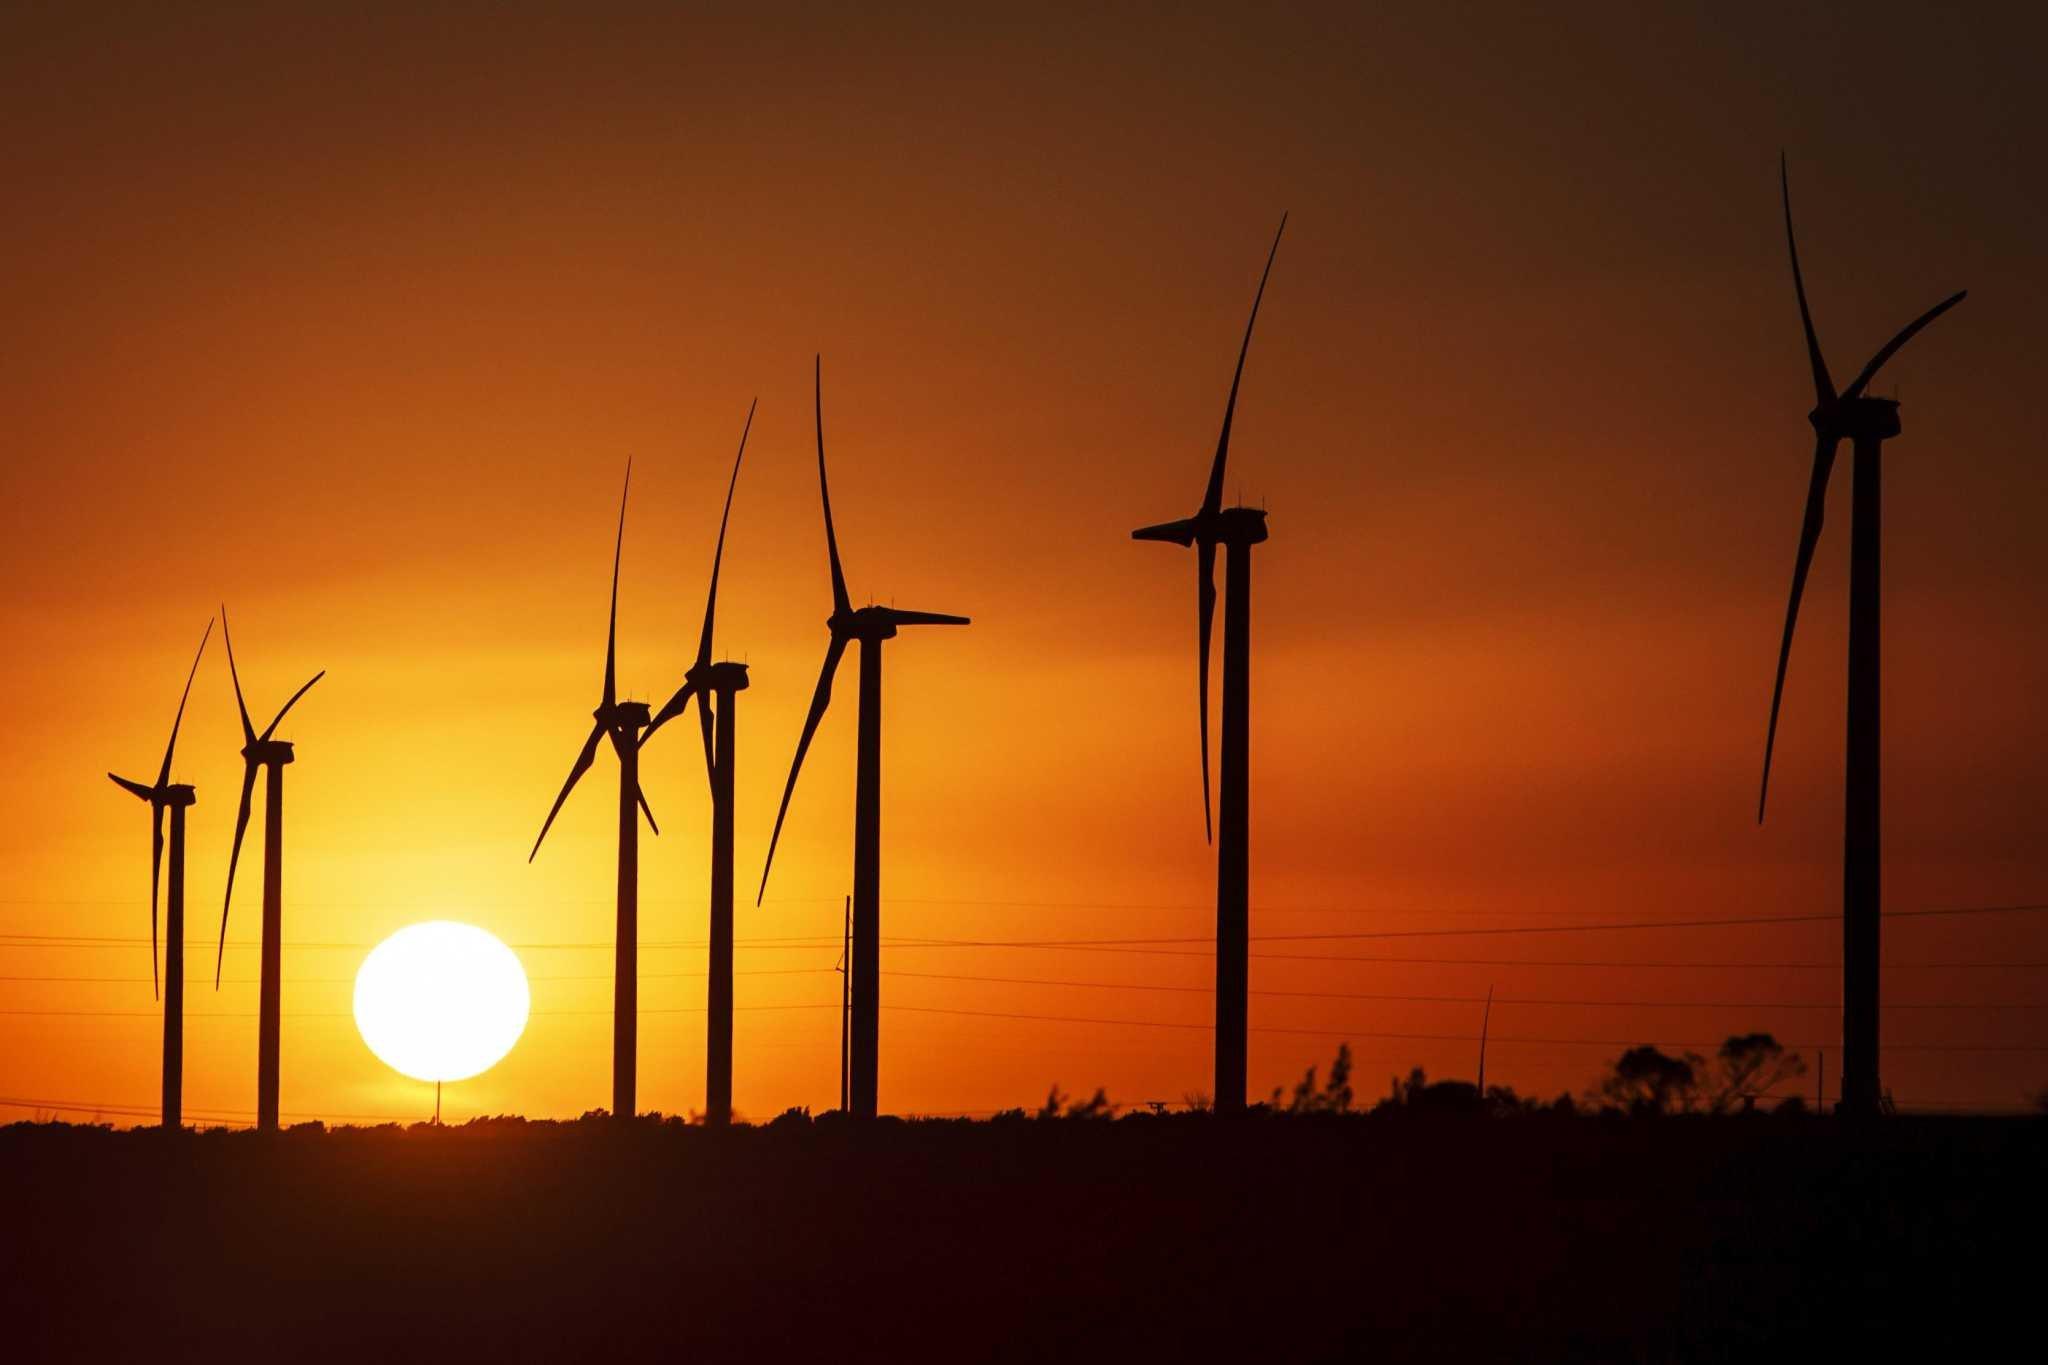 Houston's Energy Patch Taking Seismic Shift